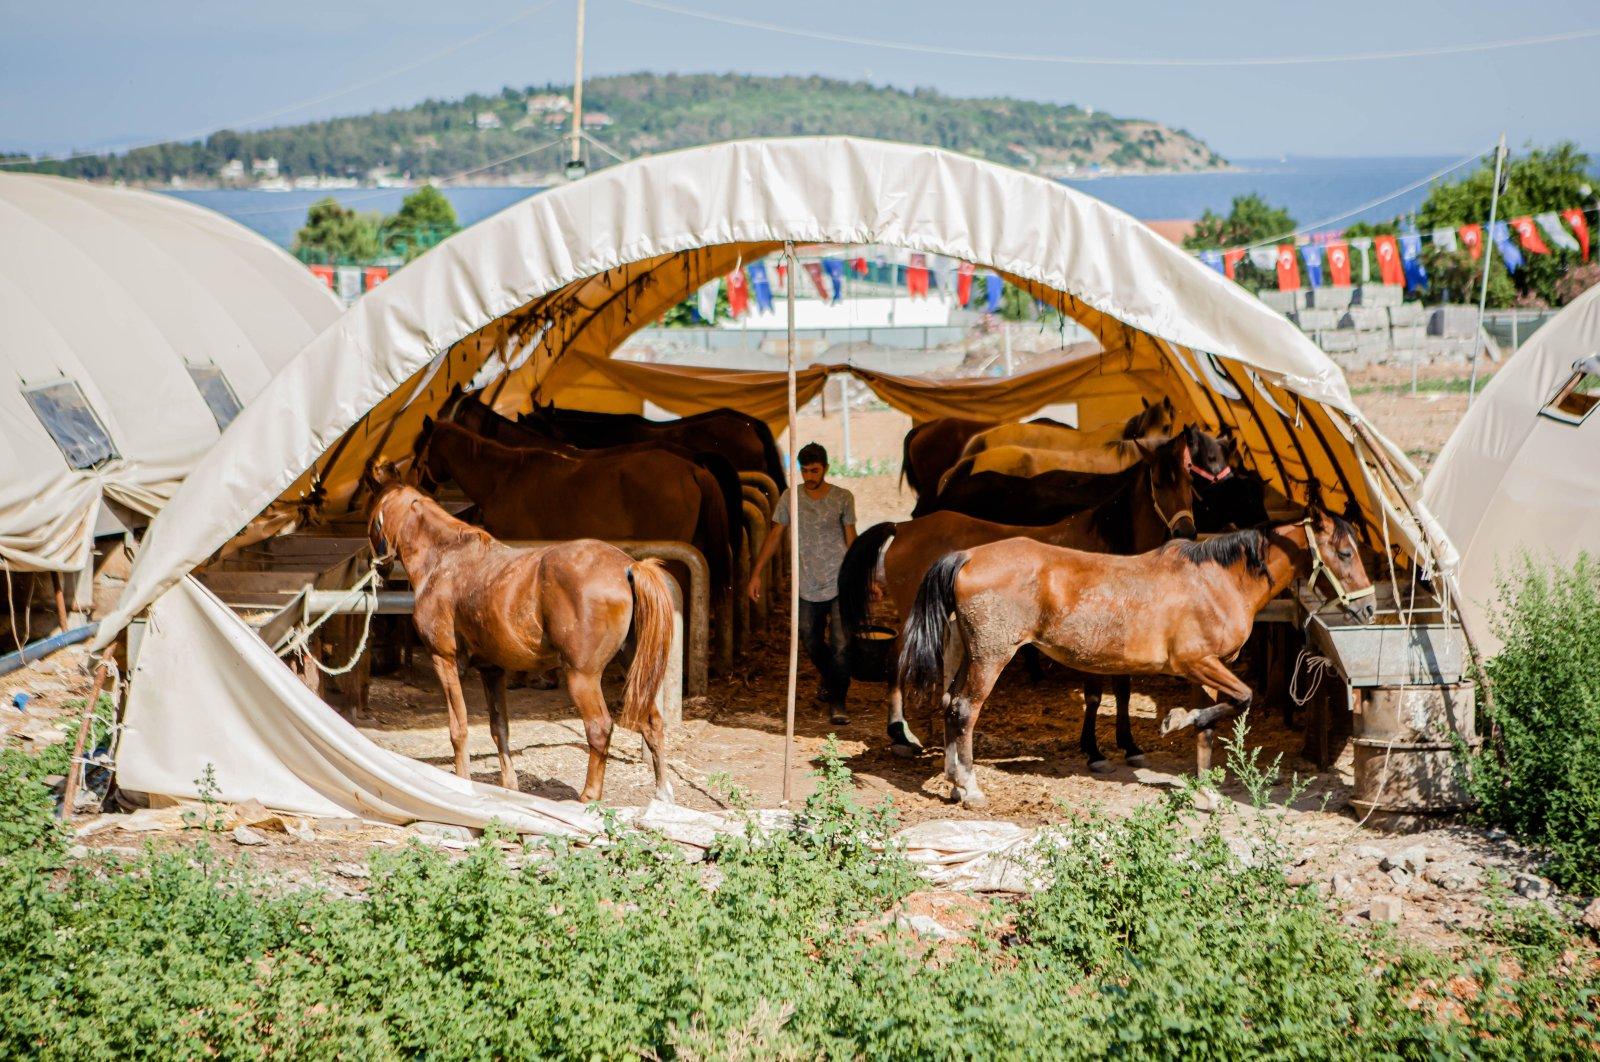 Horses are seen in their stable on Büyükada, Istanbul, Turkey, Sept. 18, 2020. (Photo by Hatice Çınar)